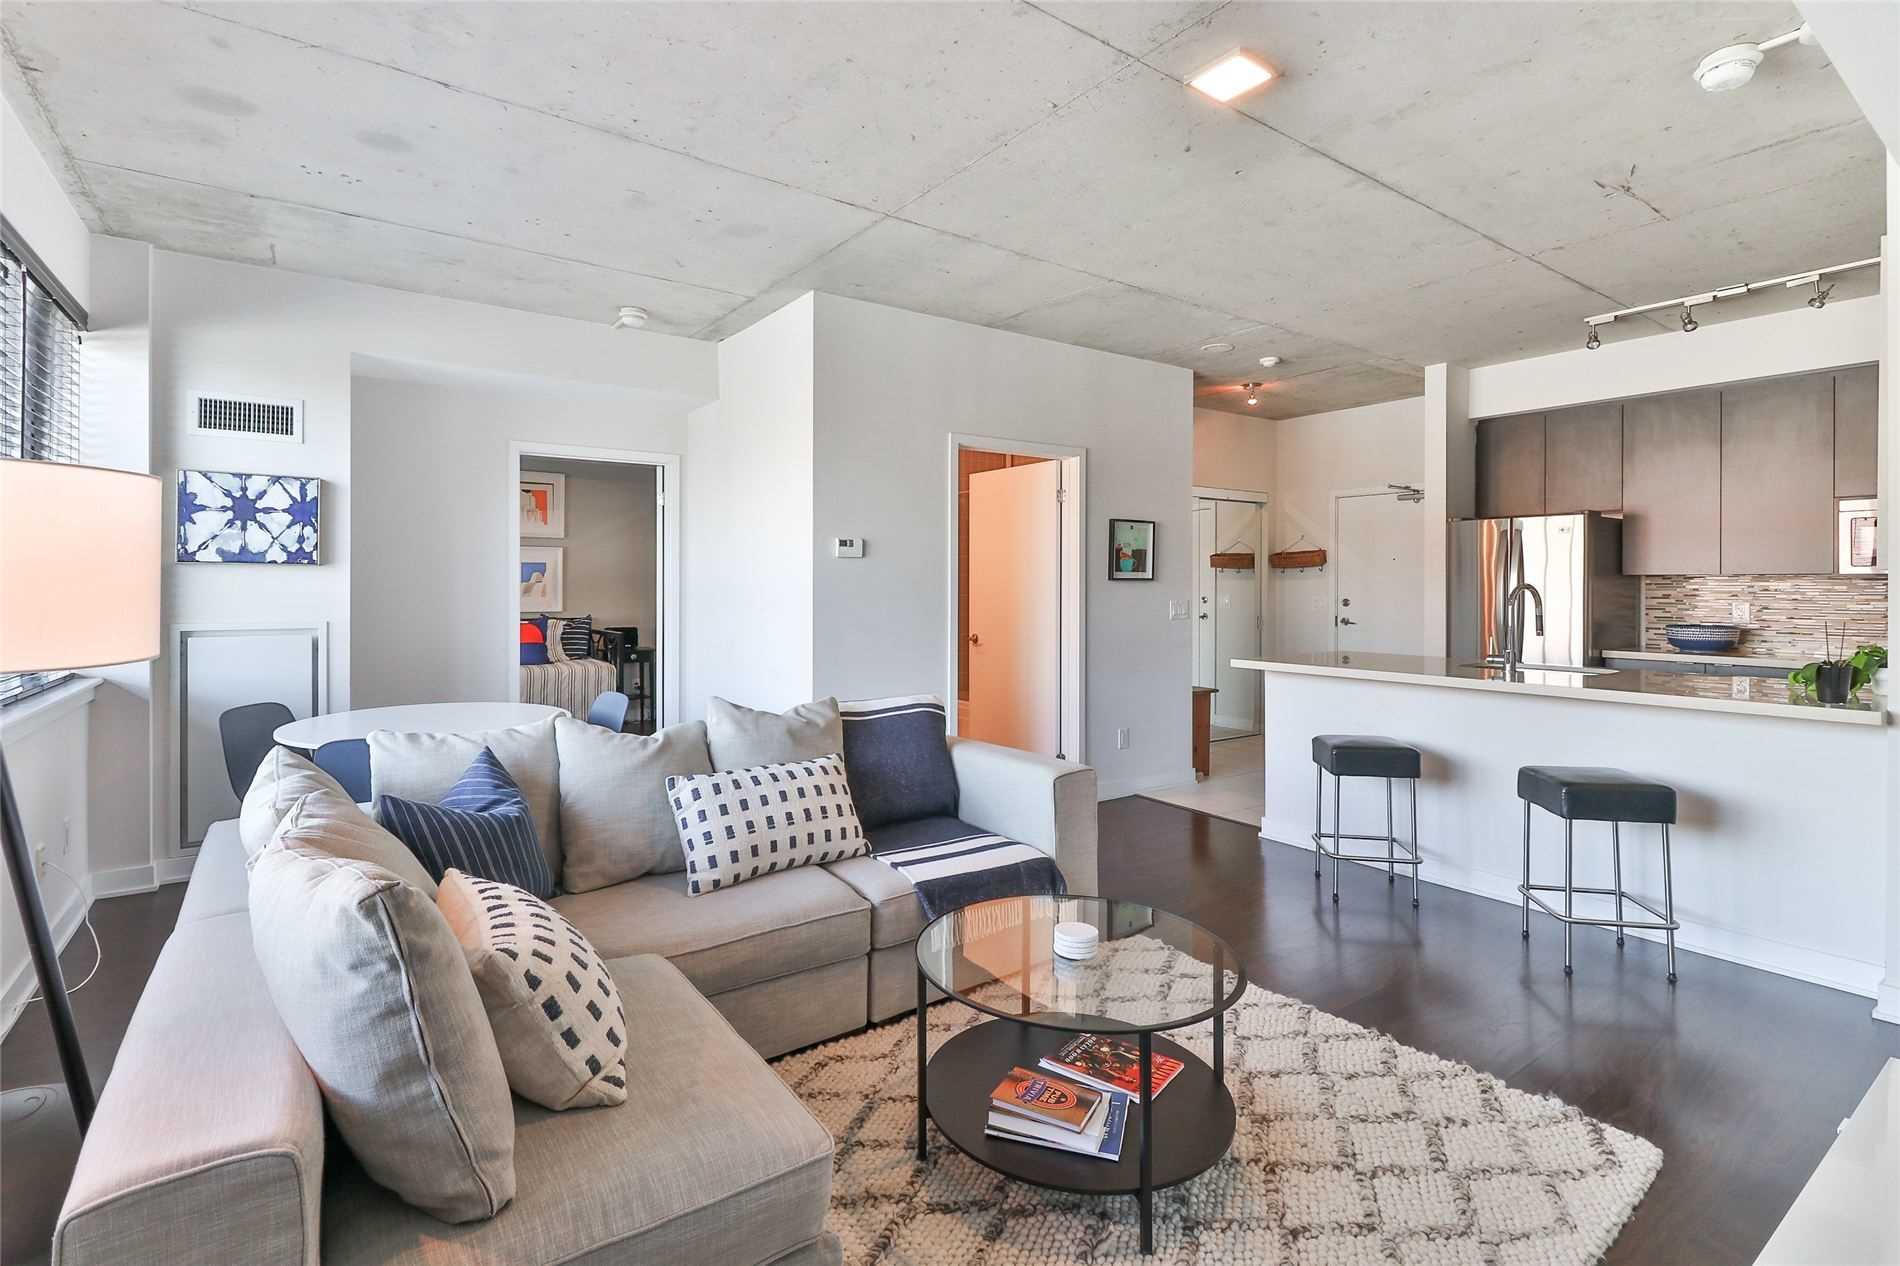 510 - 400 Wellington St W - Waterfront Communities C1 Condo Apt for sale, 2 Bedrooms (C5321788) - #1